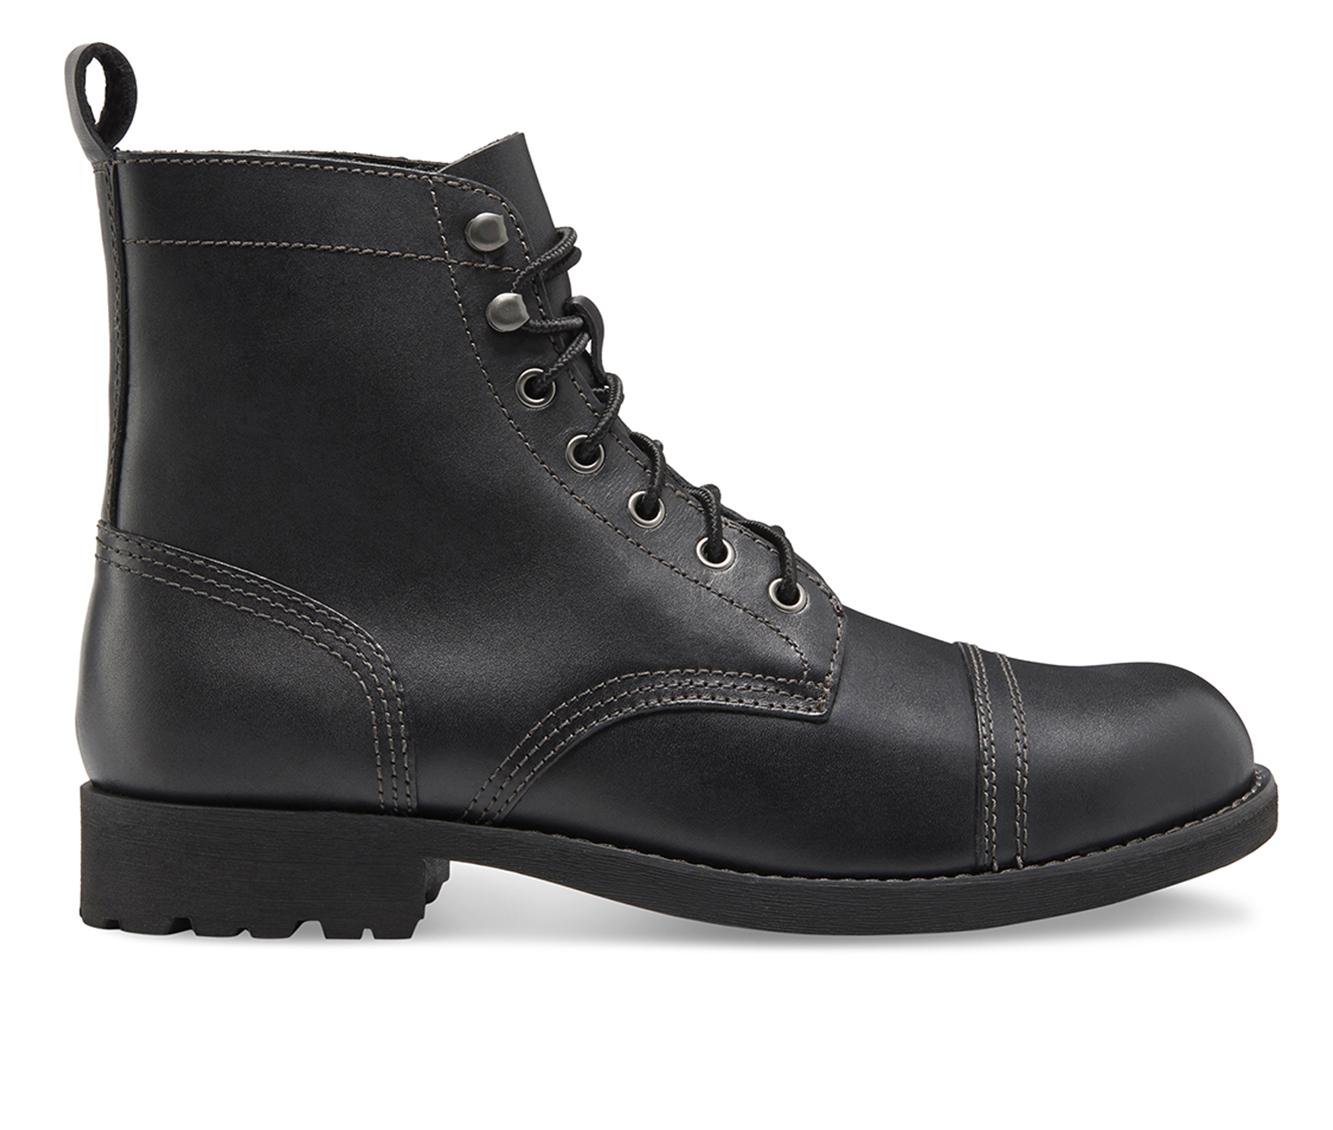 Eastland Jayce Men's Boots (Black Leather)